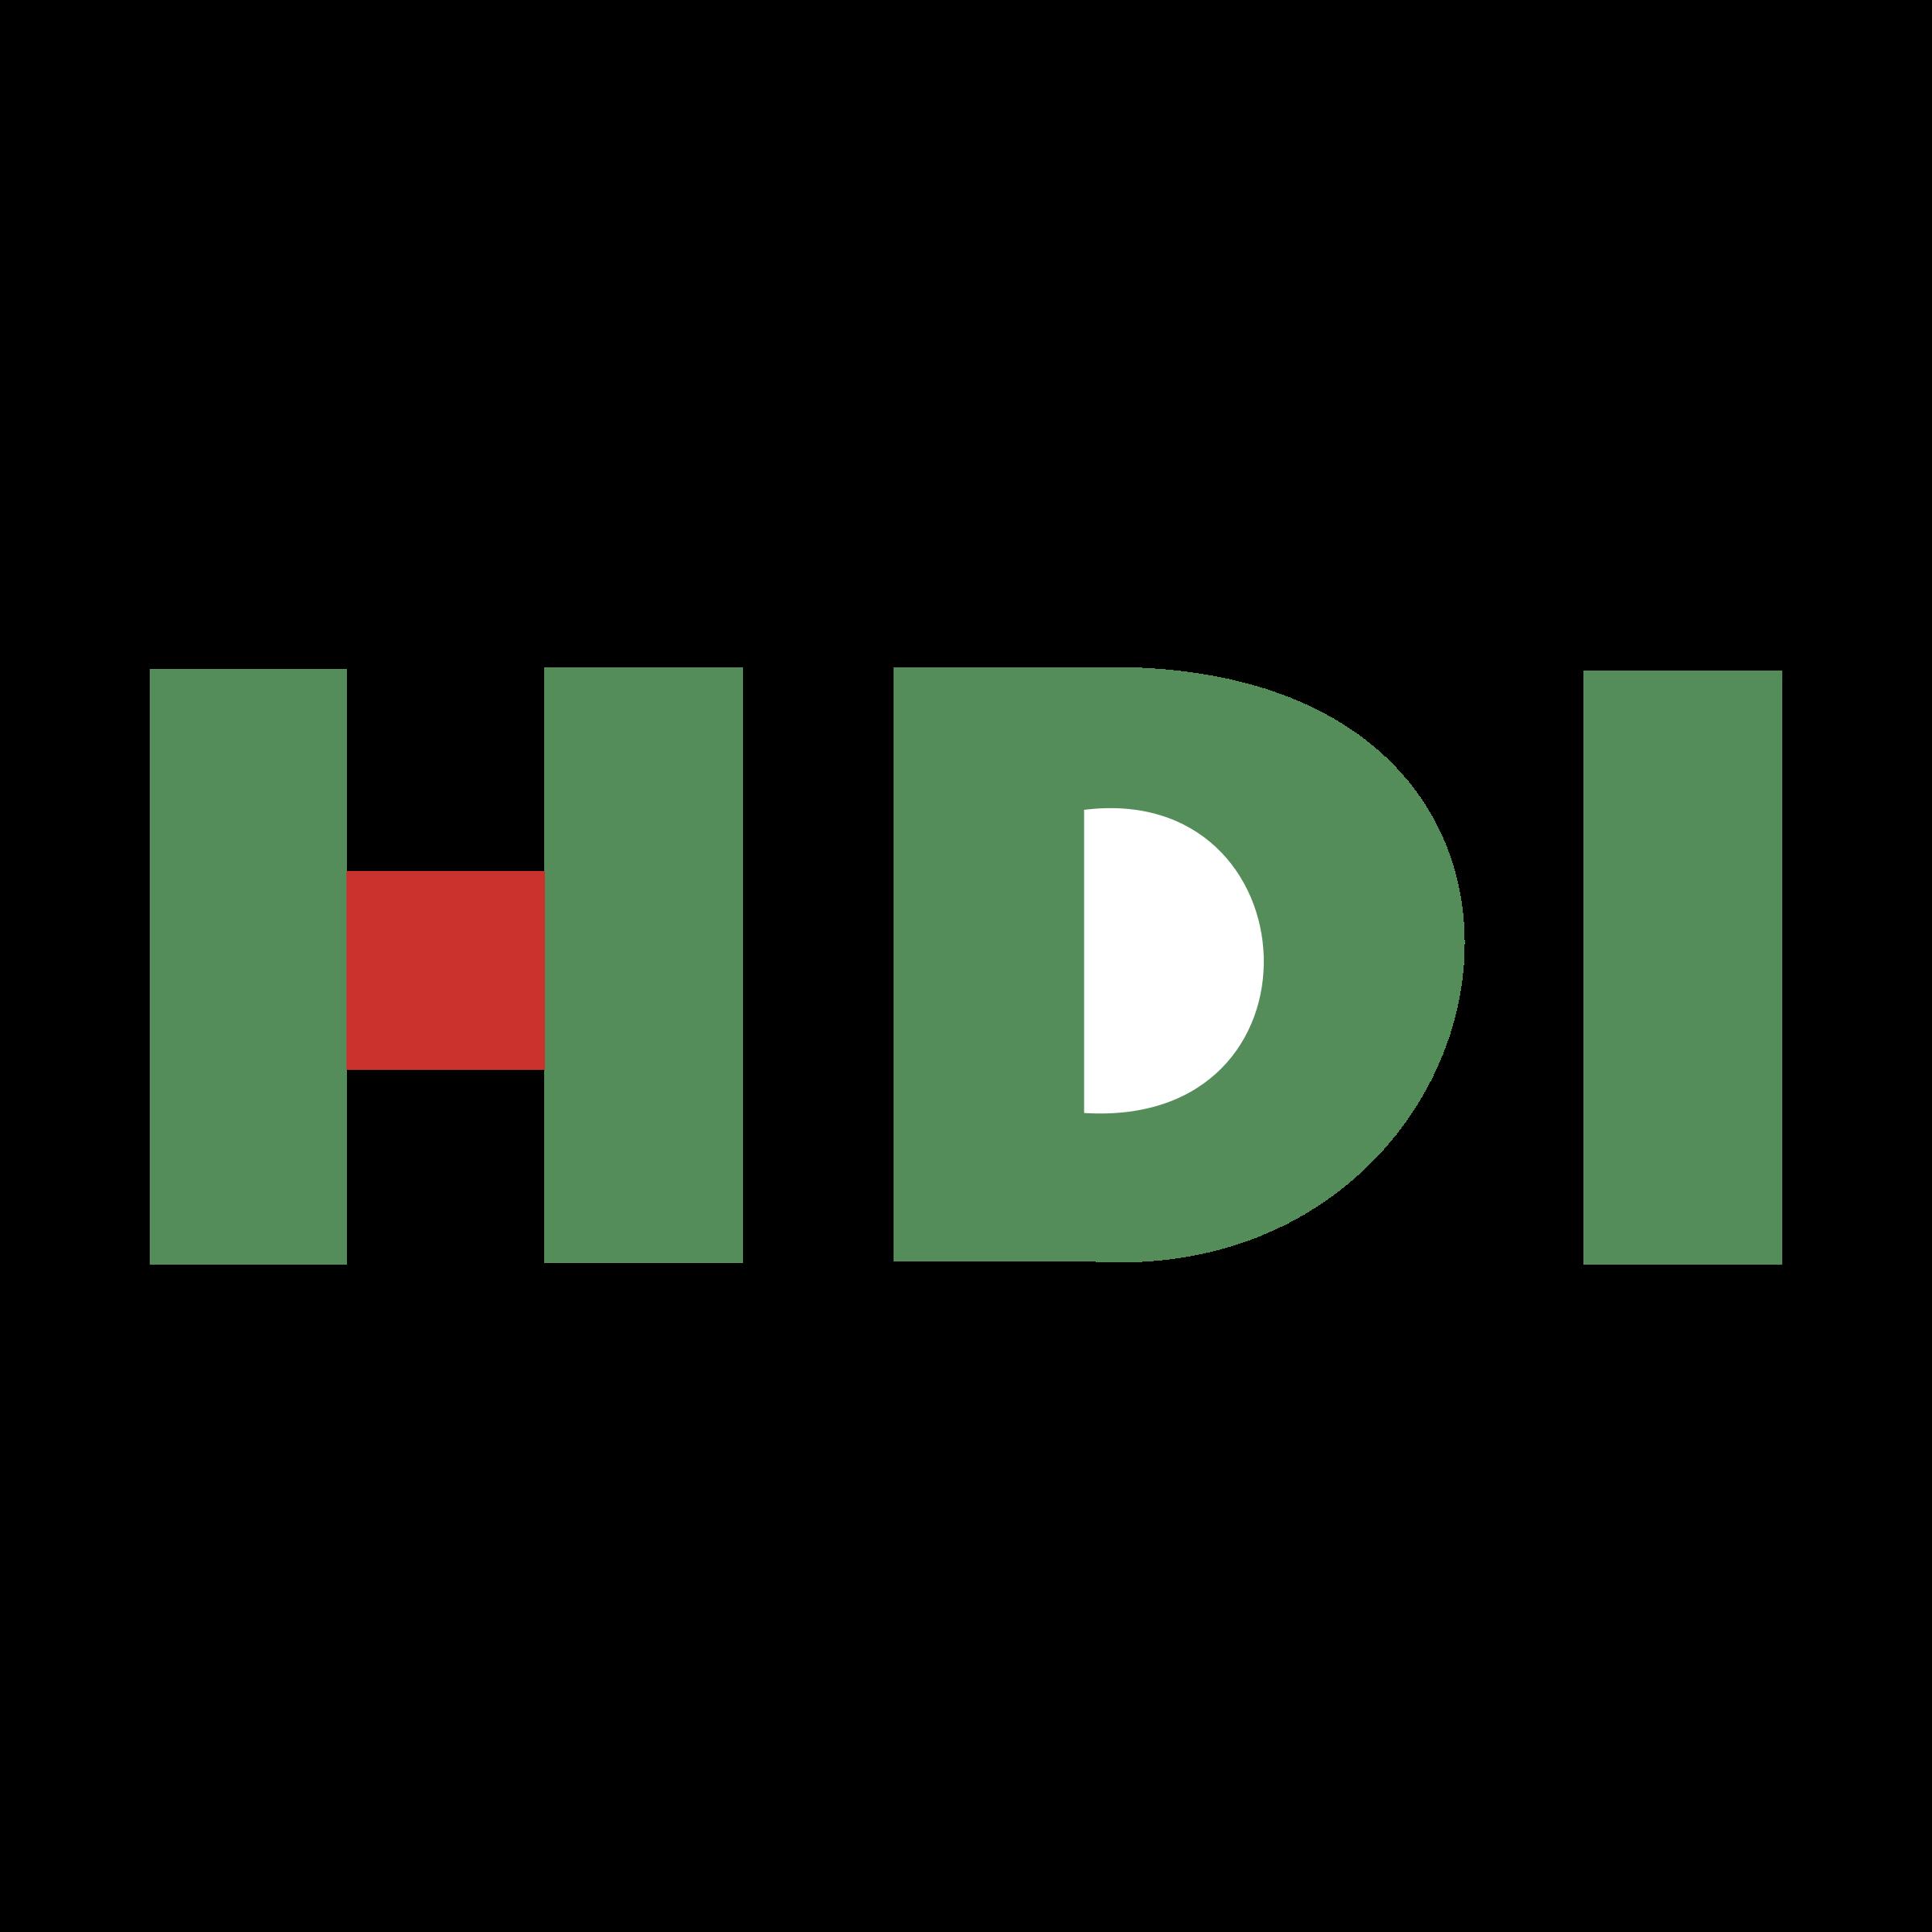 HDI Logo PNG Transparent & SVG Vector.